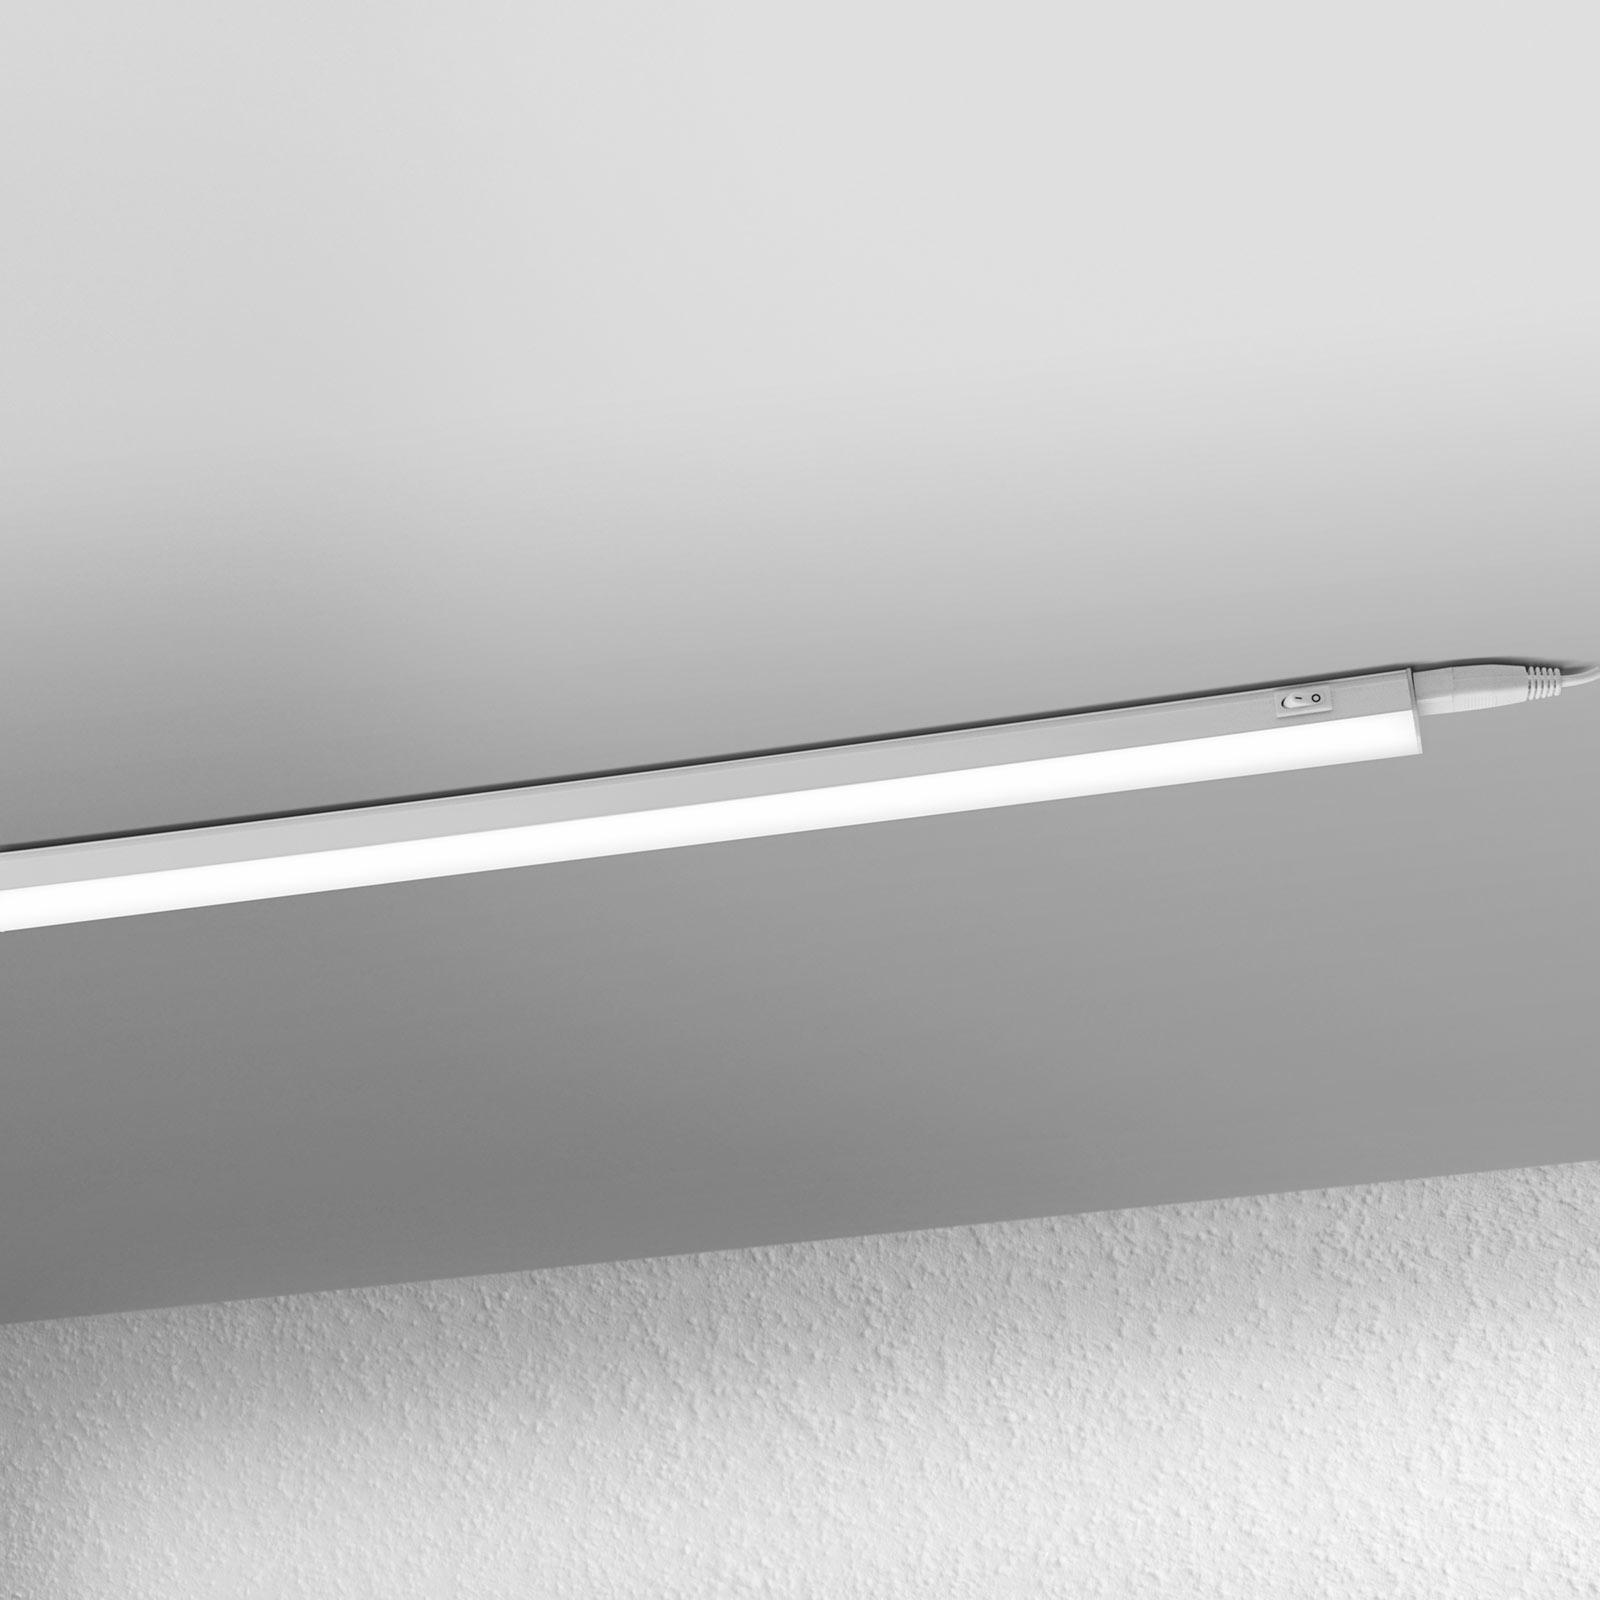 LEDVANCE Batten LED under-cabinet light_6106115_1